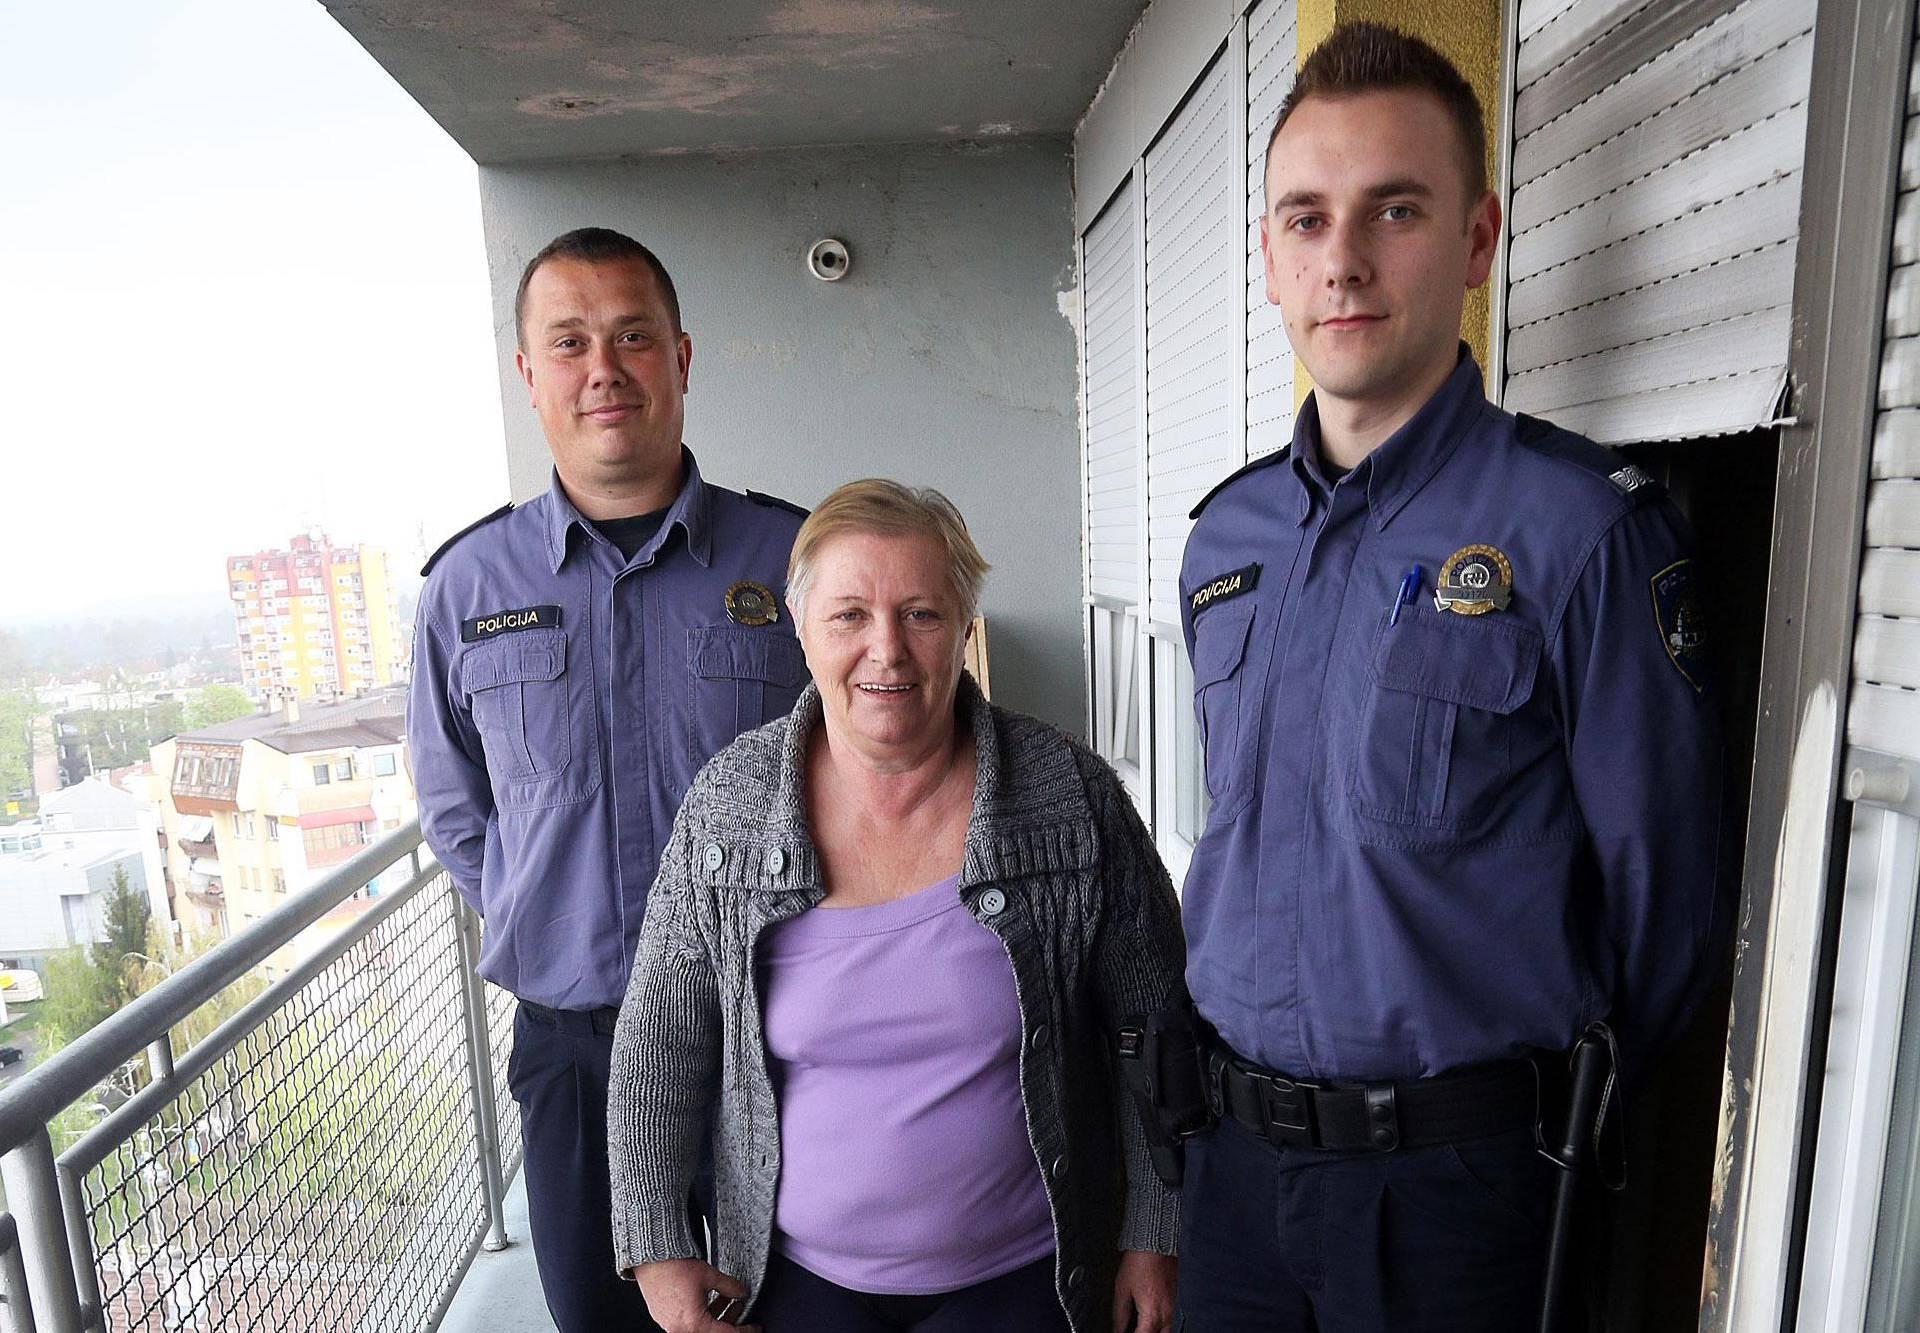 Policajci: Trčali smo na 9. kat i spasili život gospođi Katarini